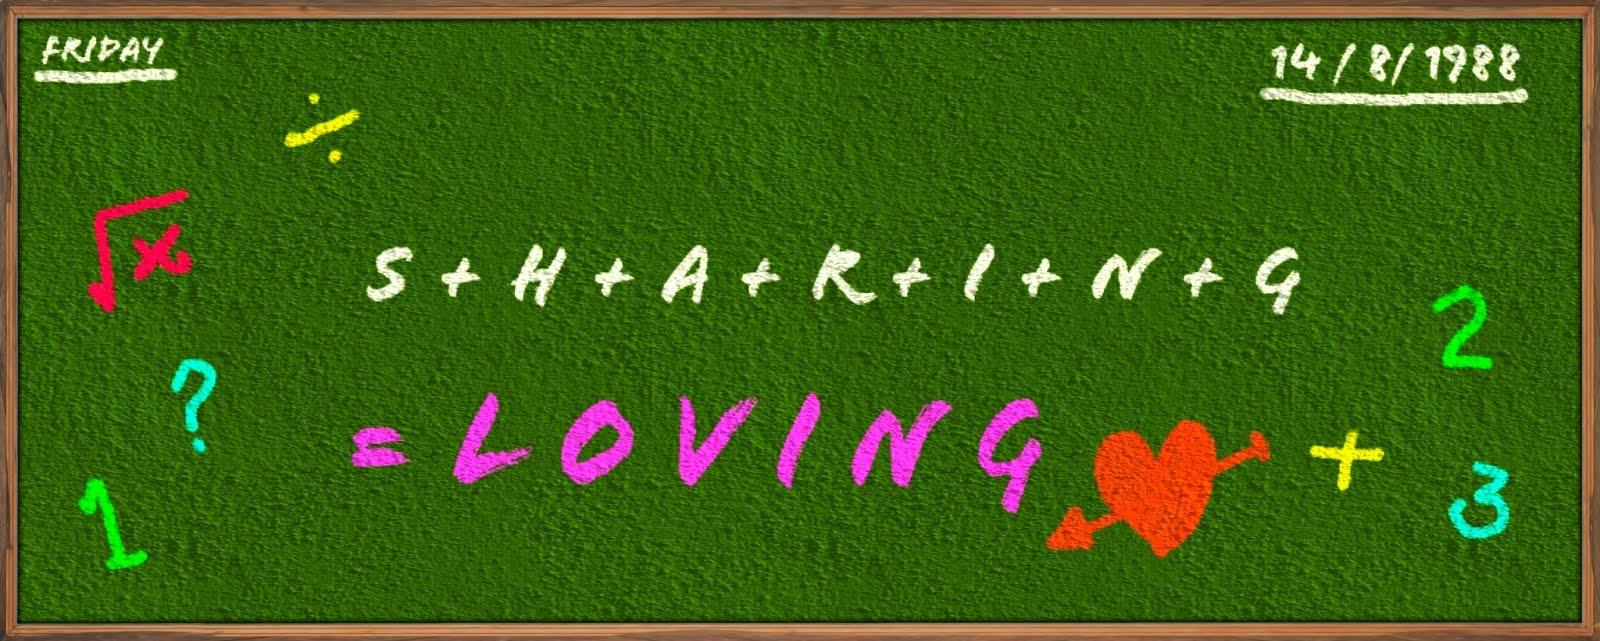 sharing is loving